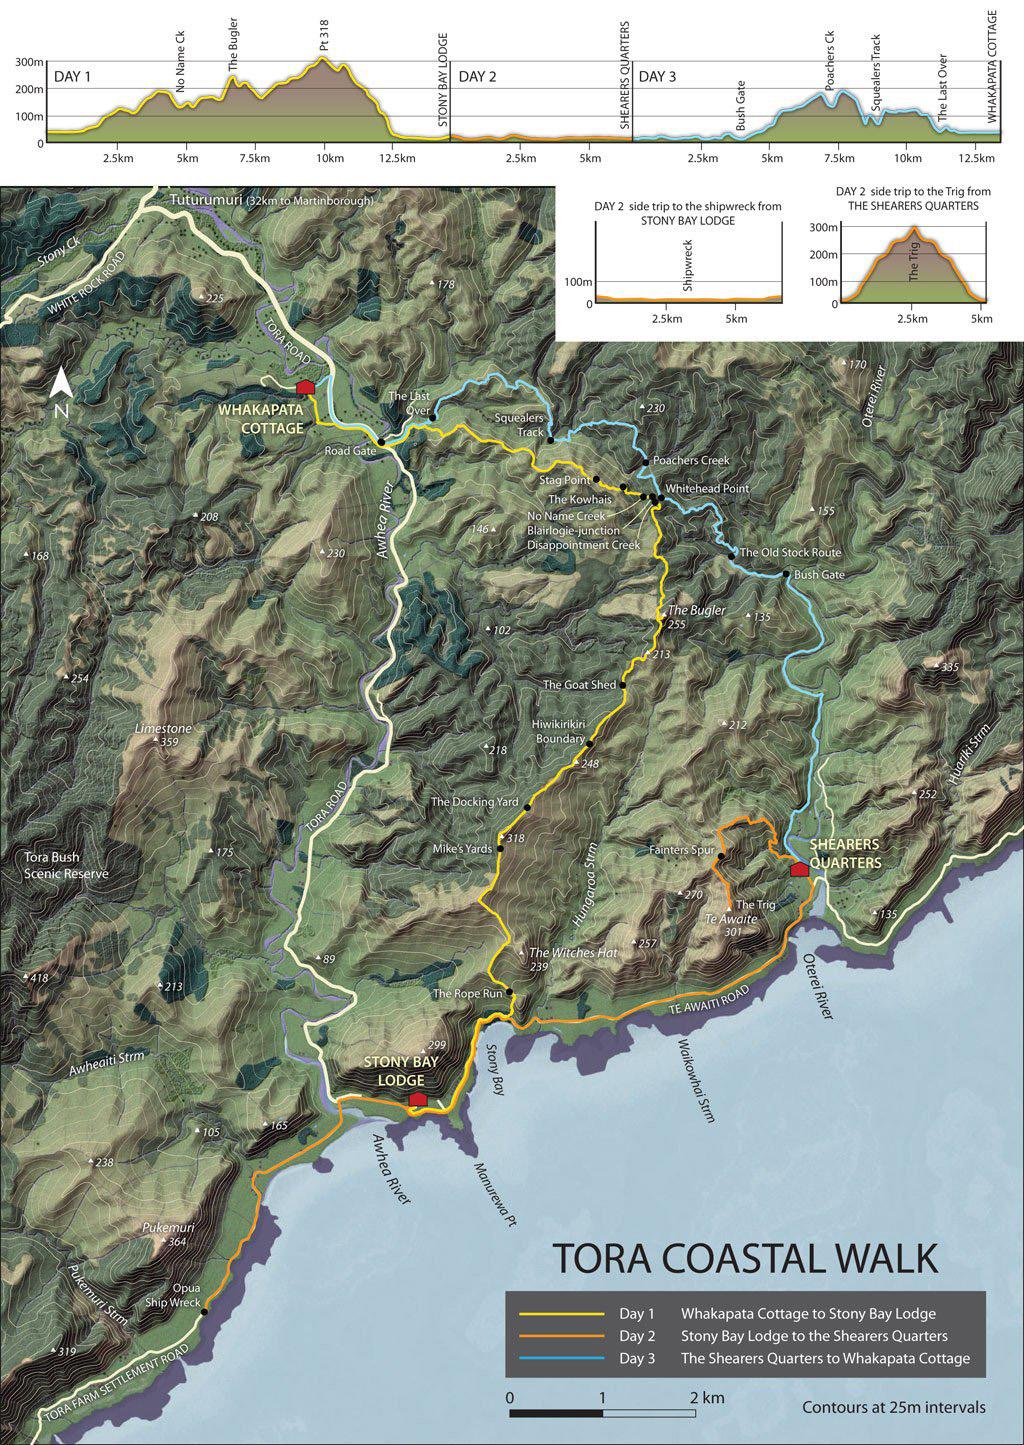 Carte de la randonnée de Tora coastal